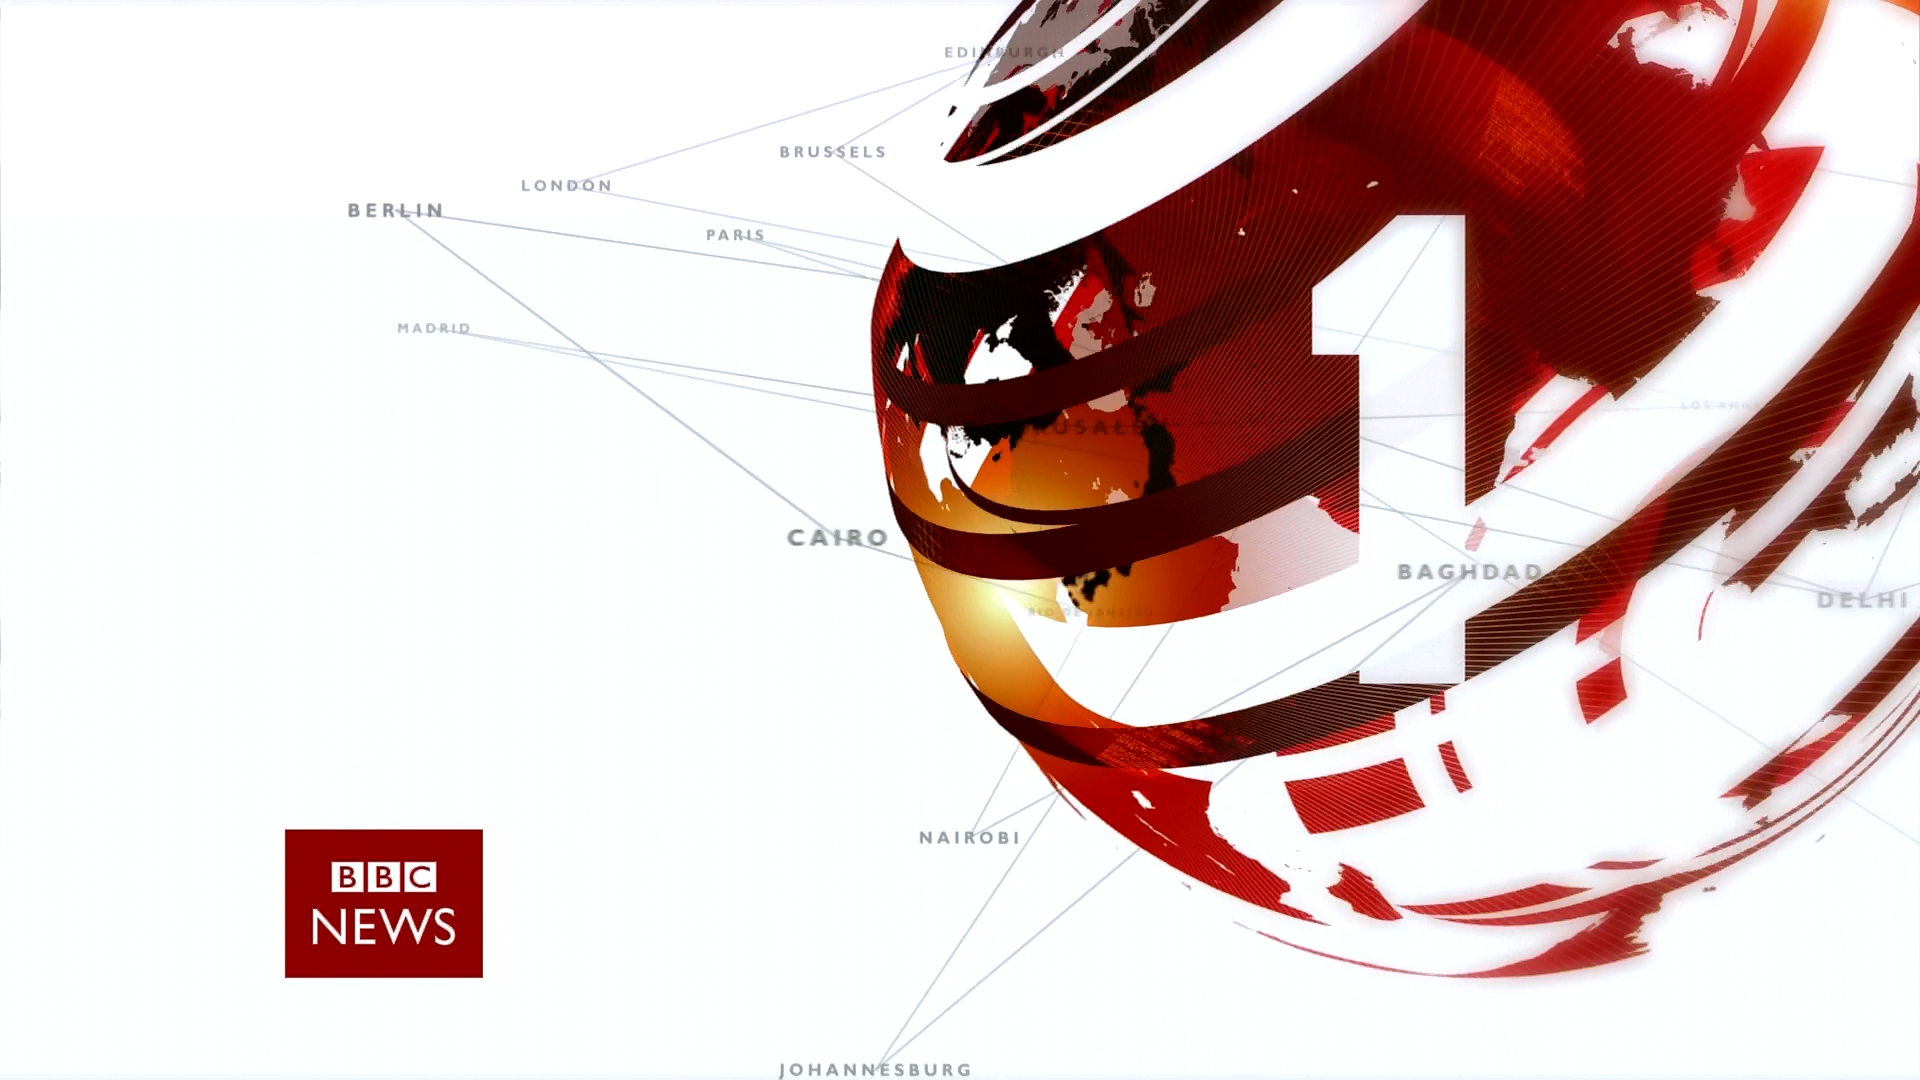 BBC News Photo: Bbc News Presenter Mistakes Copy Paper For Ipad On Air